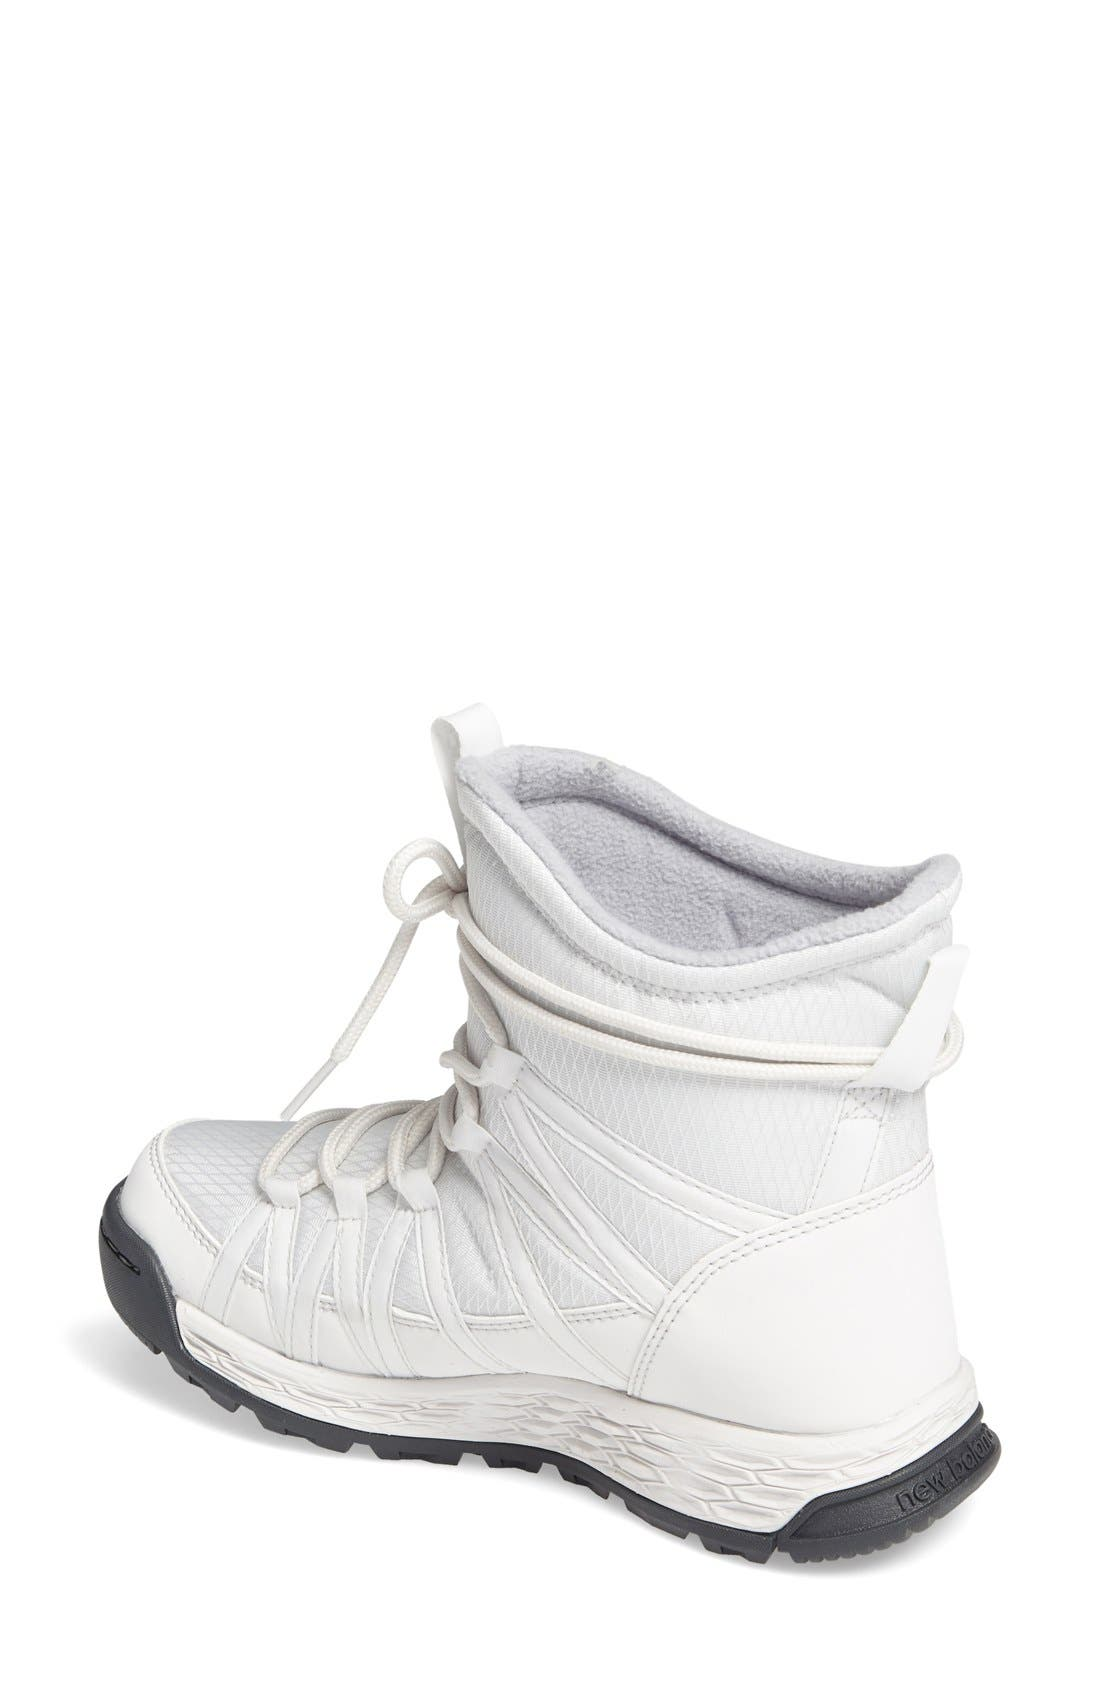 Q416 Weatherproof Snow Boot,                             Alternate thumbnail 2, color,                             White